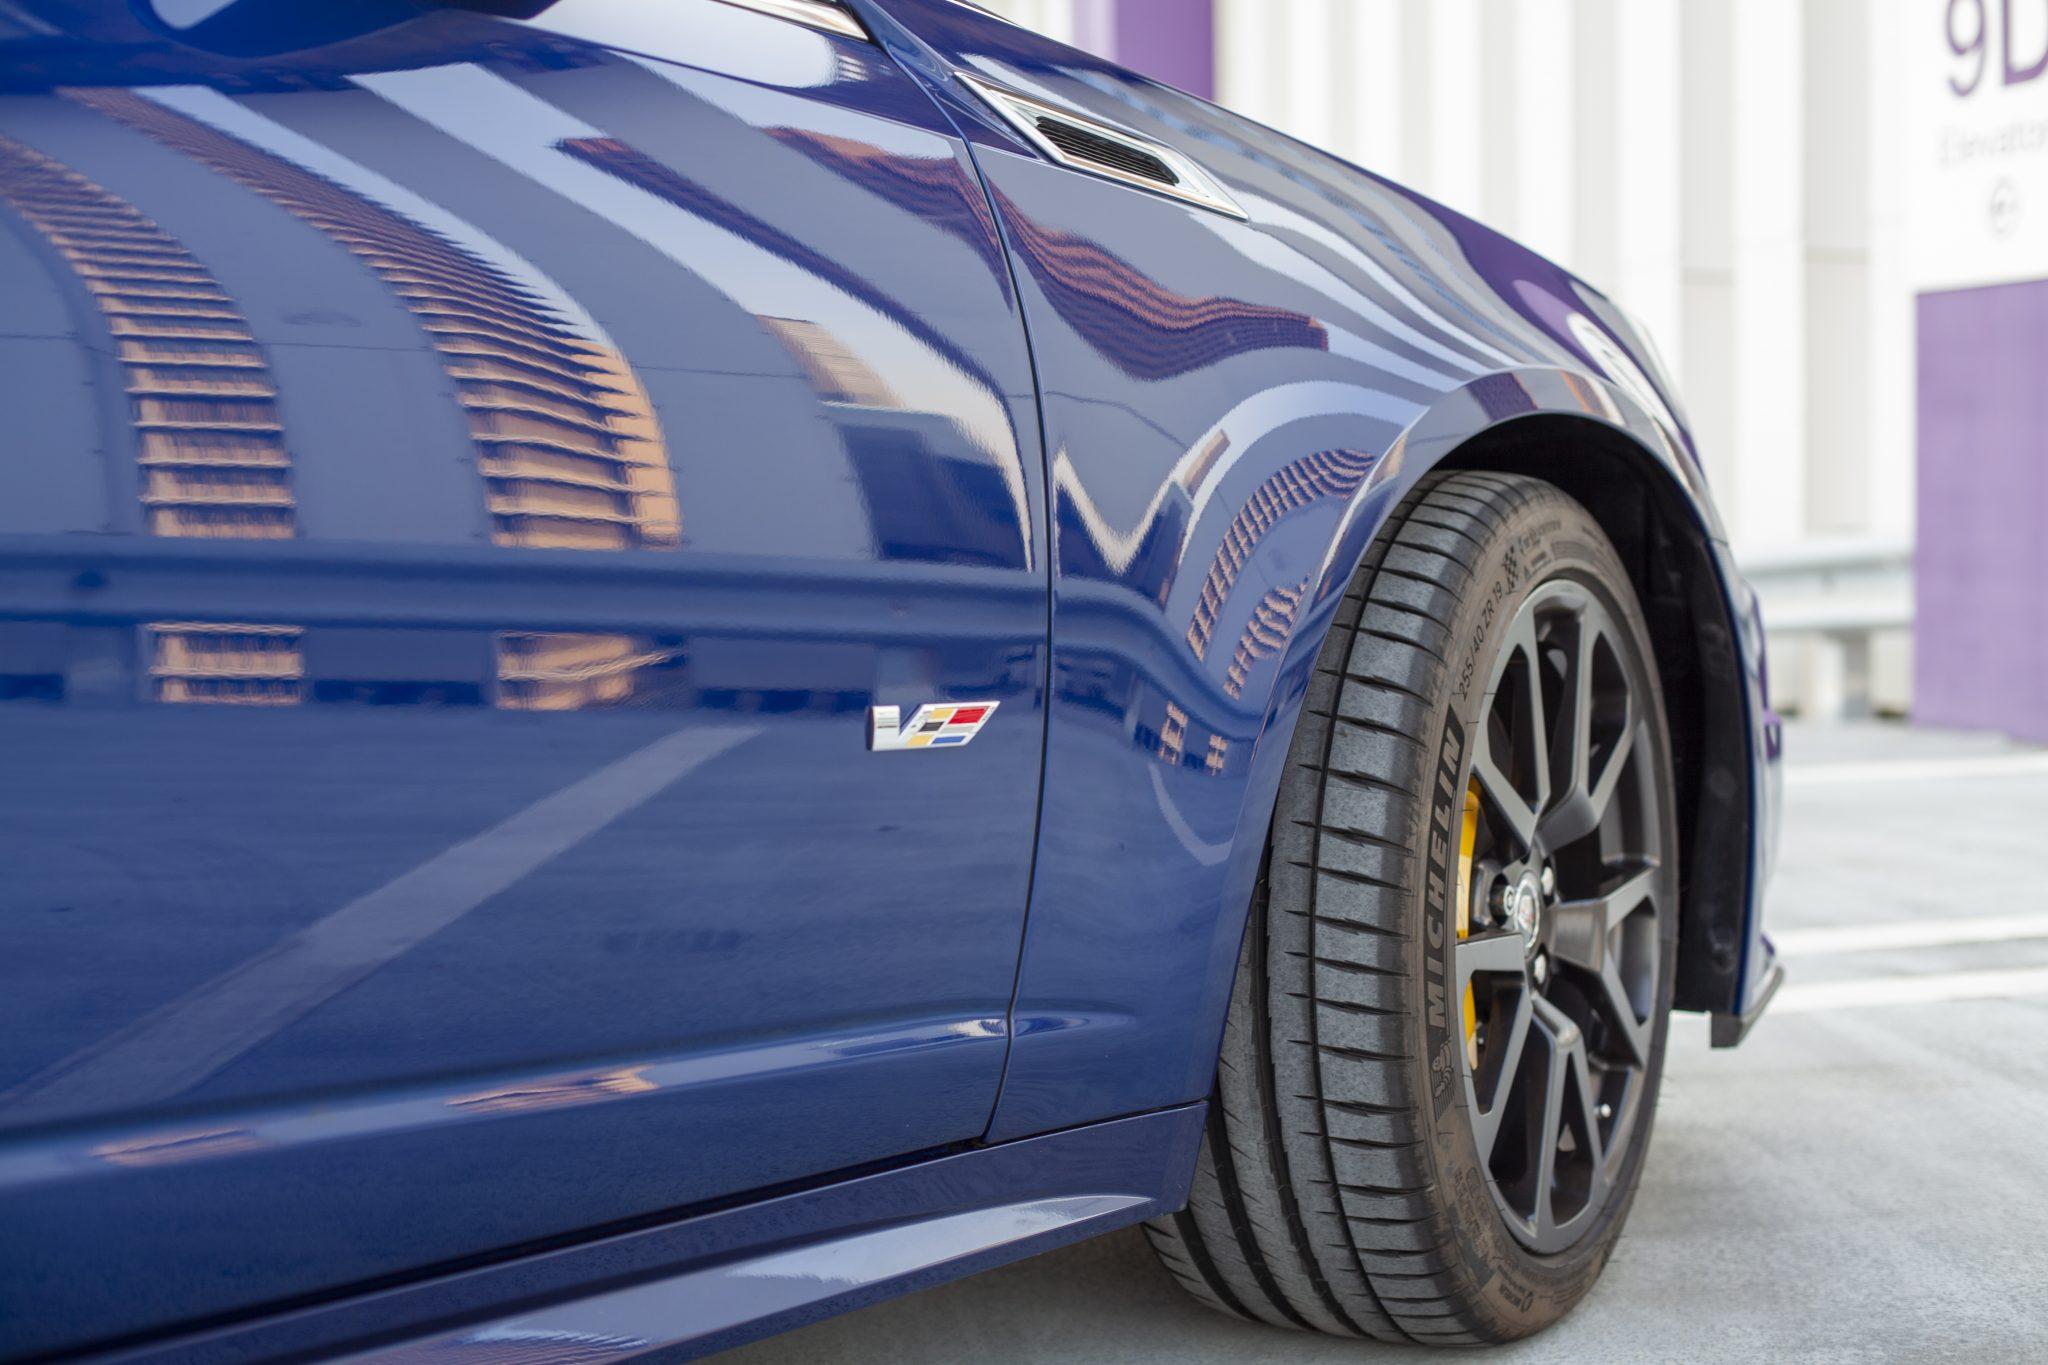 2012 Cadillac CTS-V Wagon front wheel quarter panel